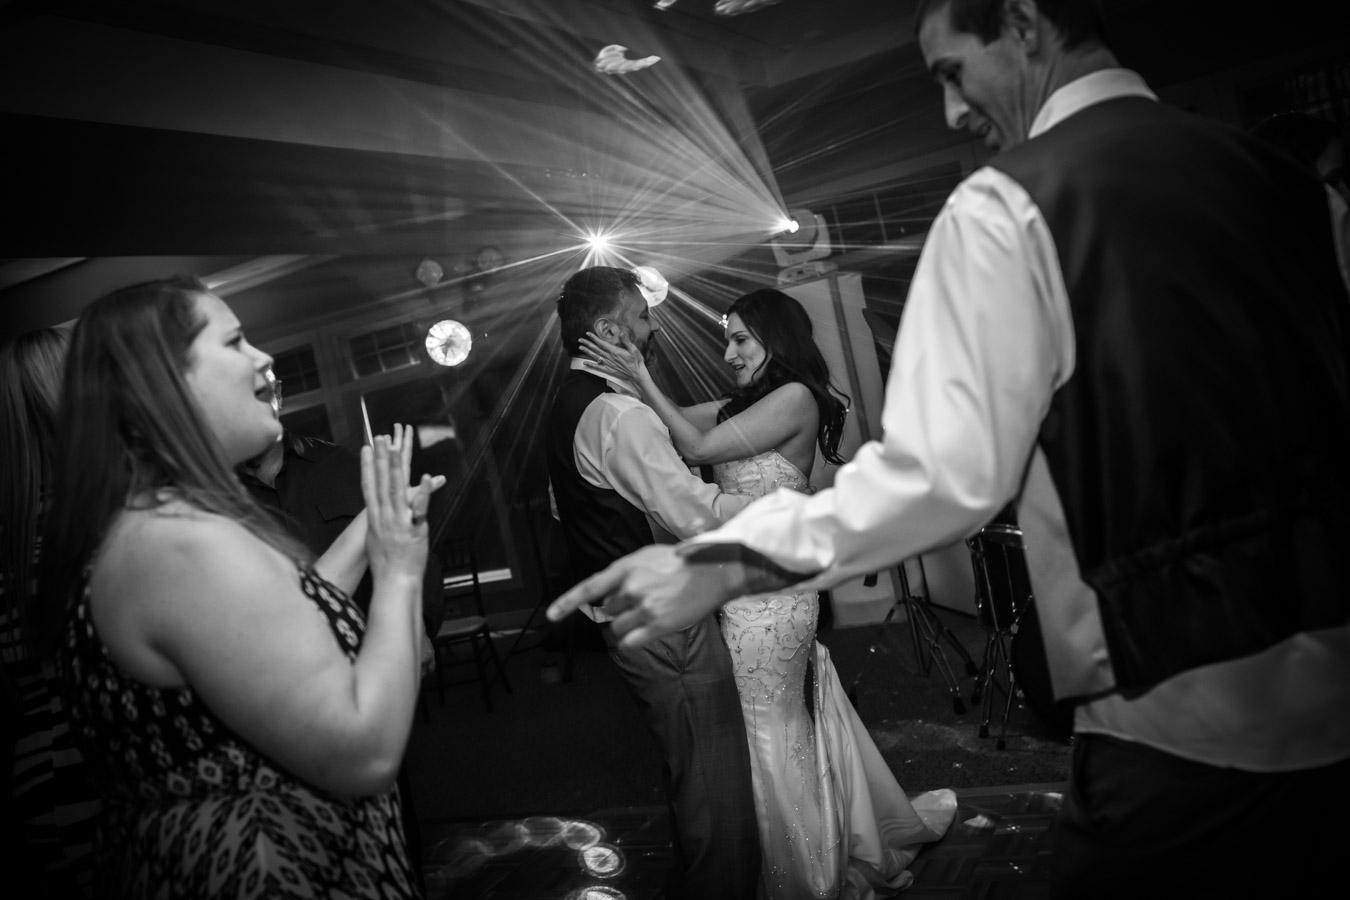 NEPA_Pocono_Weddings_Rob_Lettieri_Photography_19.jpg